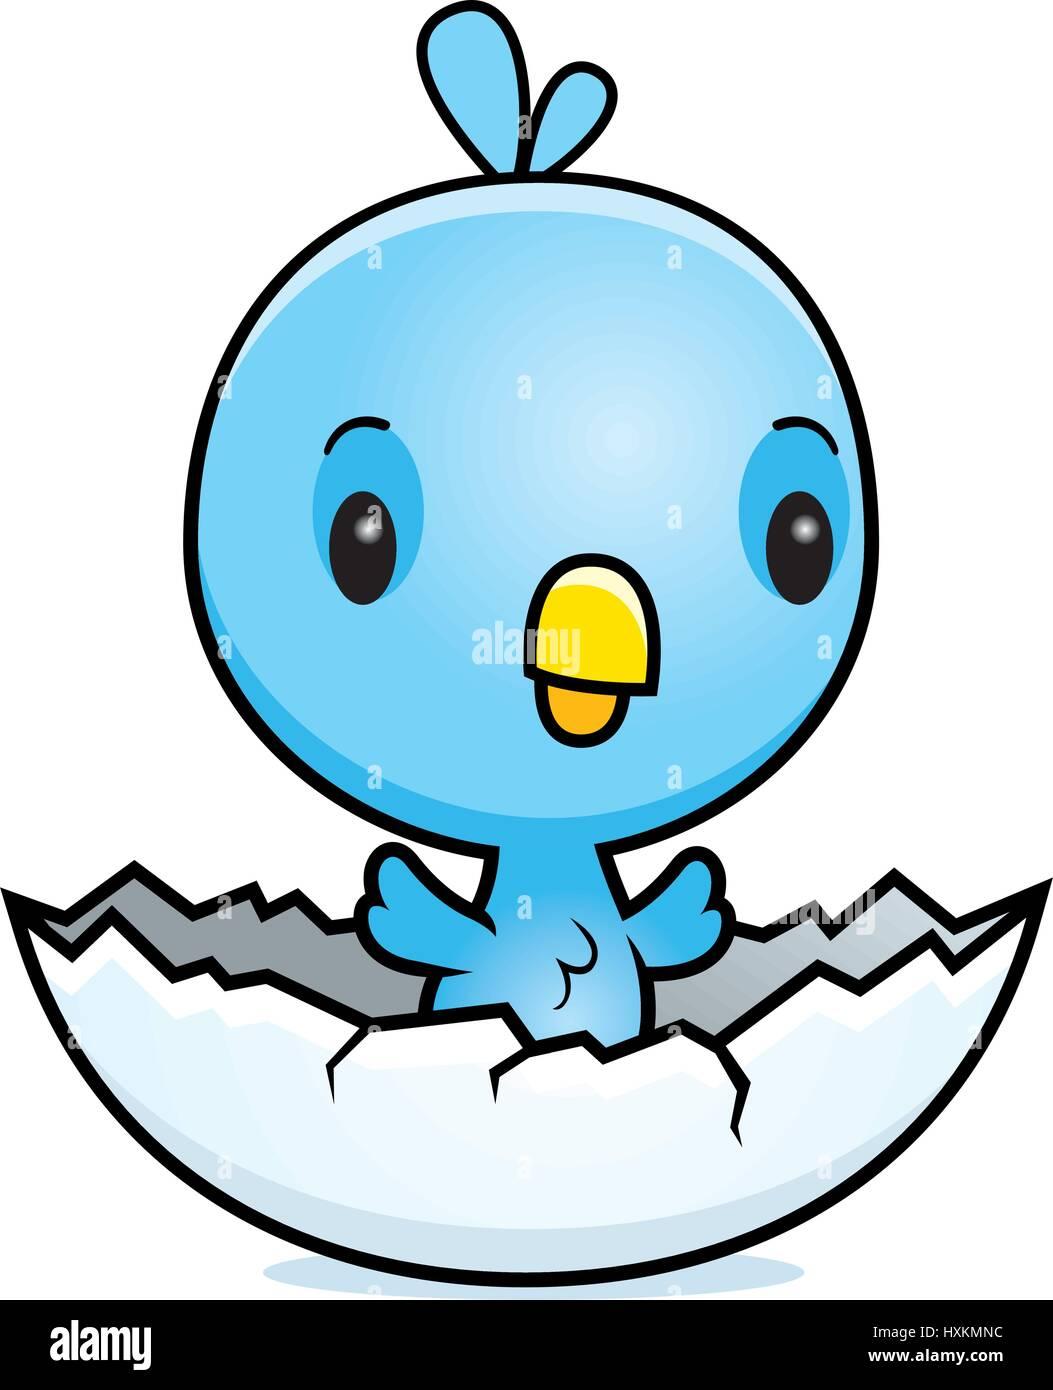 a cartoon illustration of a baby blue bird hatching from an egg rh alamy com baby bird cartoon images baby tweety bird cartoon